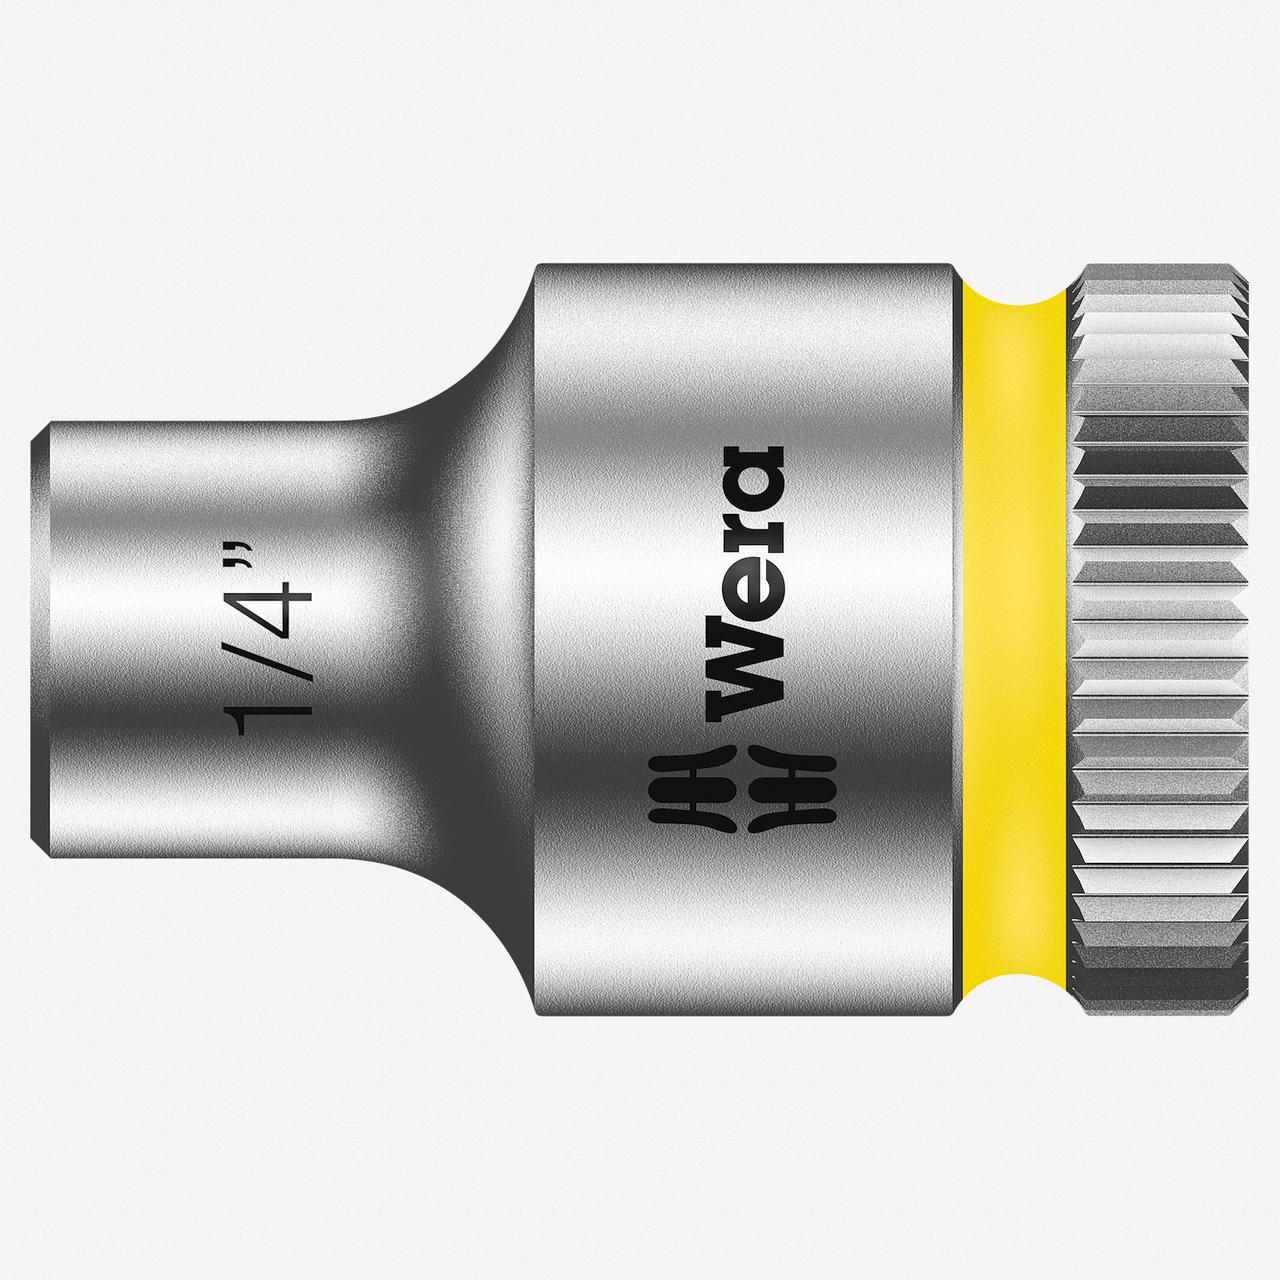 "Wera 003569 1/4"" x 3/8"" Zyklop Socket - KC Tool"